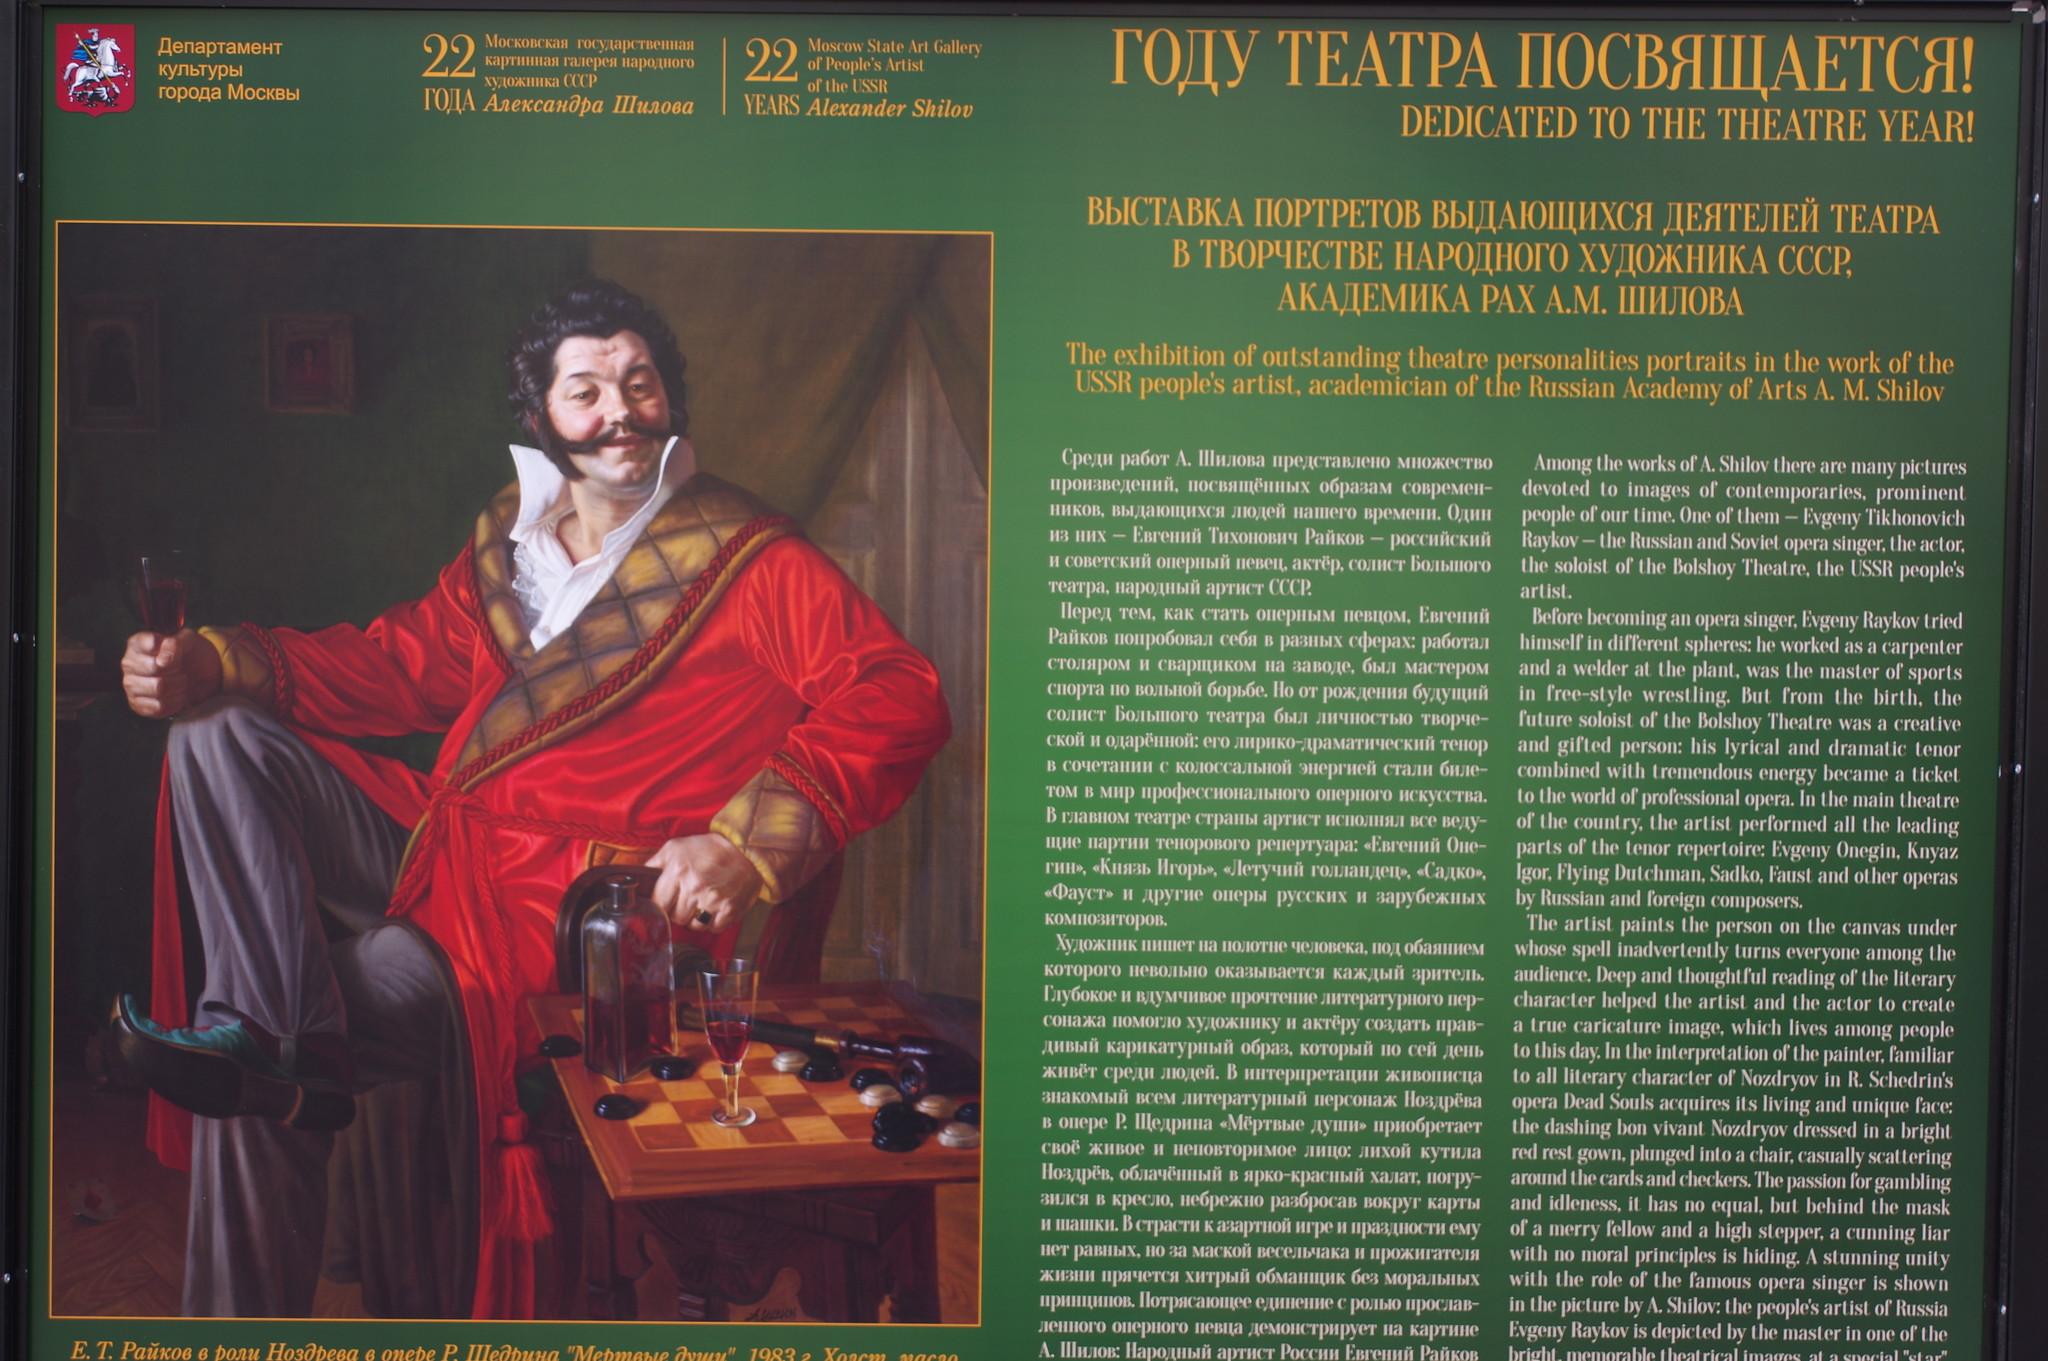 Народный артист СССР Евгений Тихонович Райков в роли Ноздрёва в опере Р. Щедрина